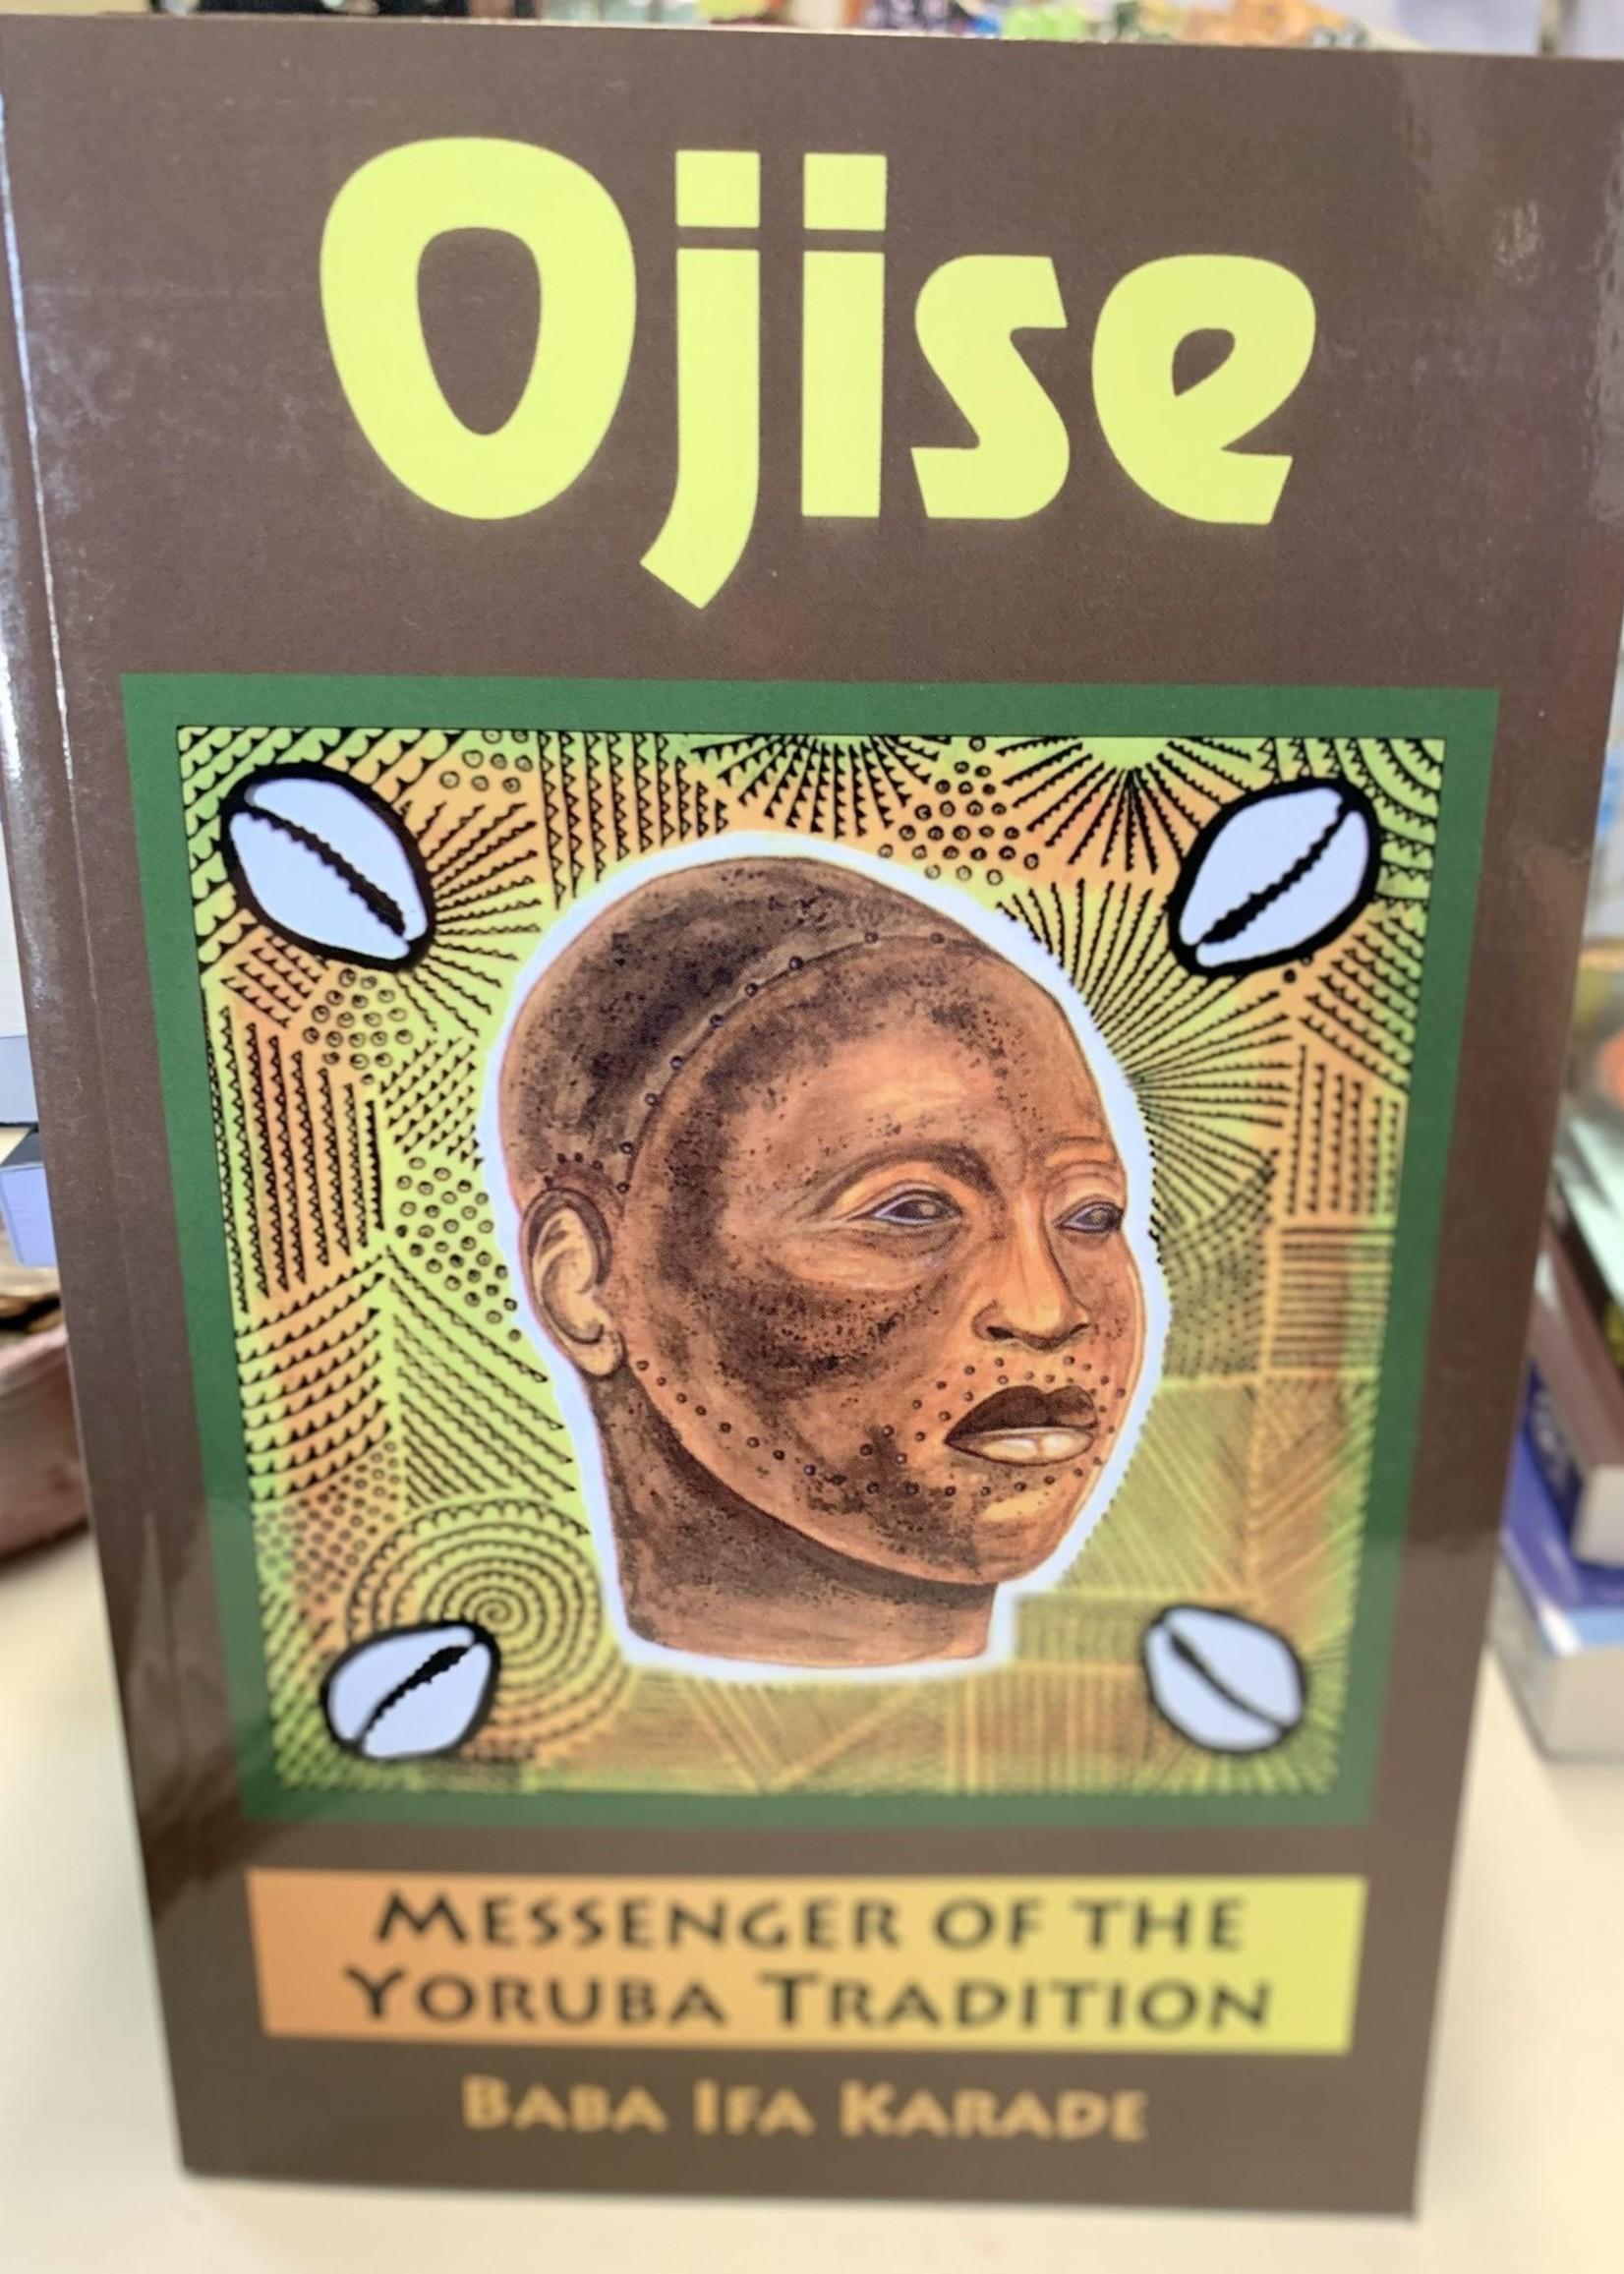 Ojise - Messenger of the Yoruba Tradition - Baba Ifa Karade